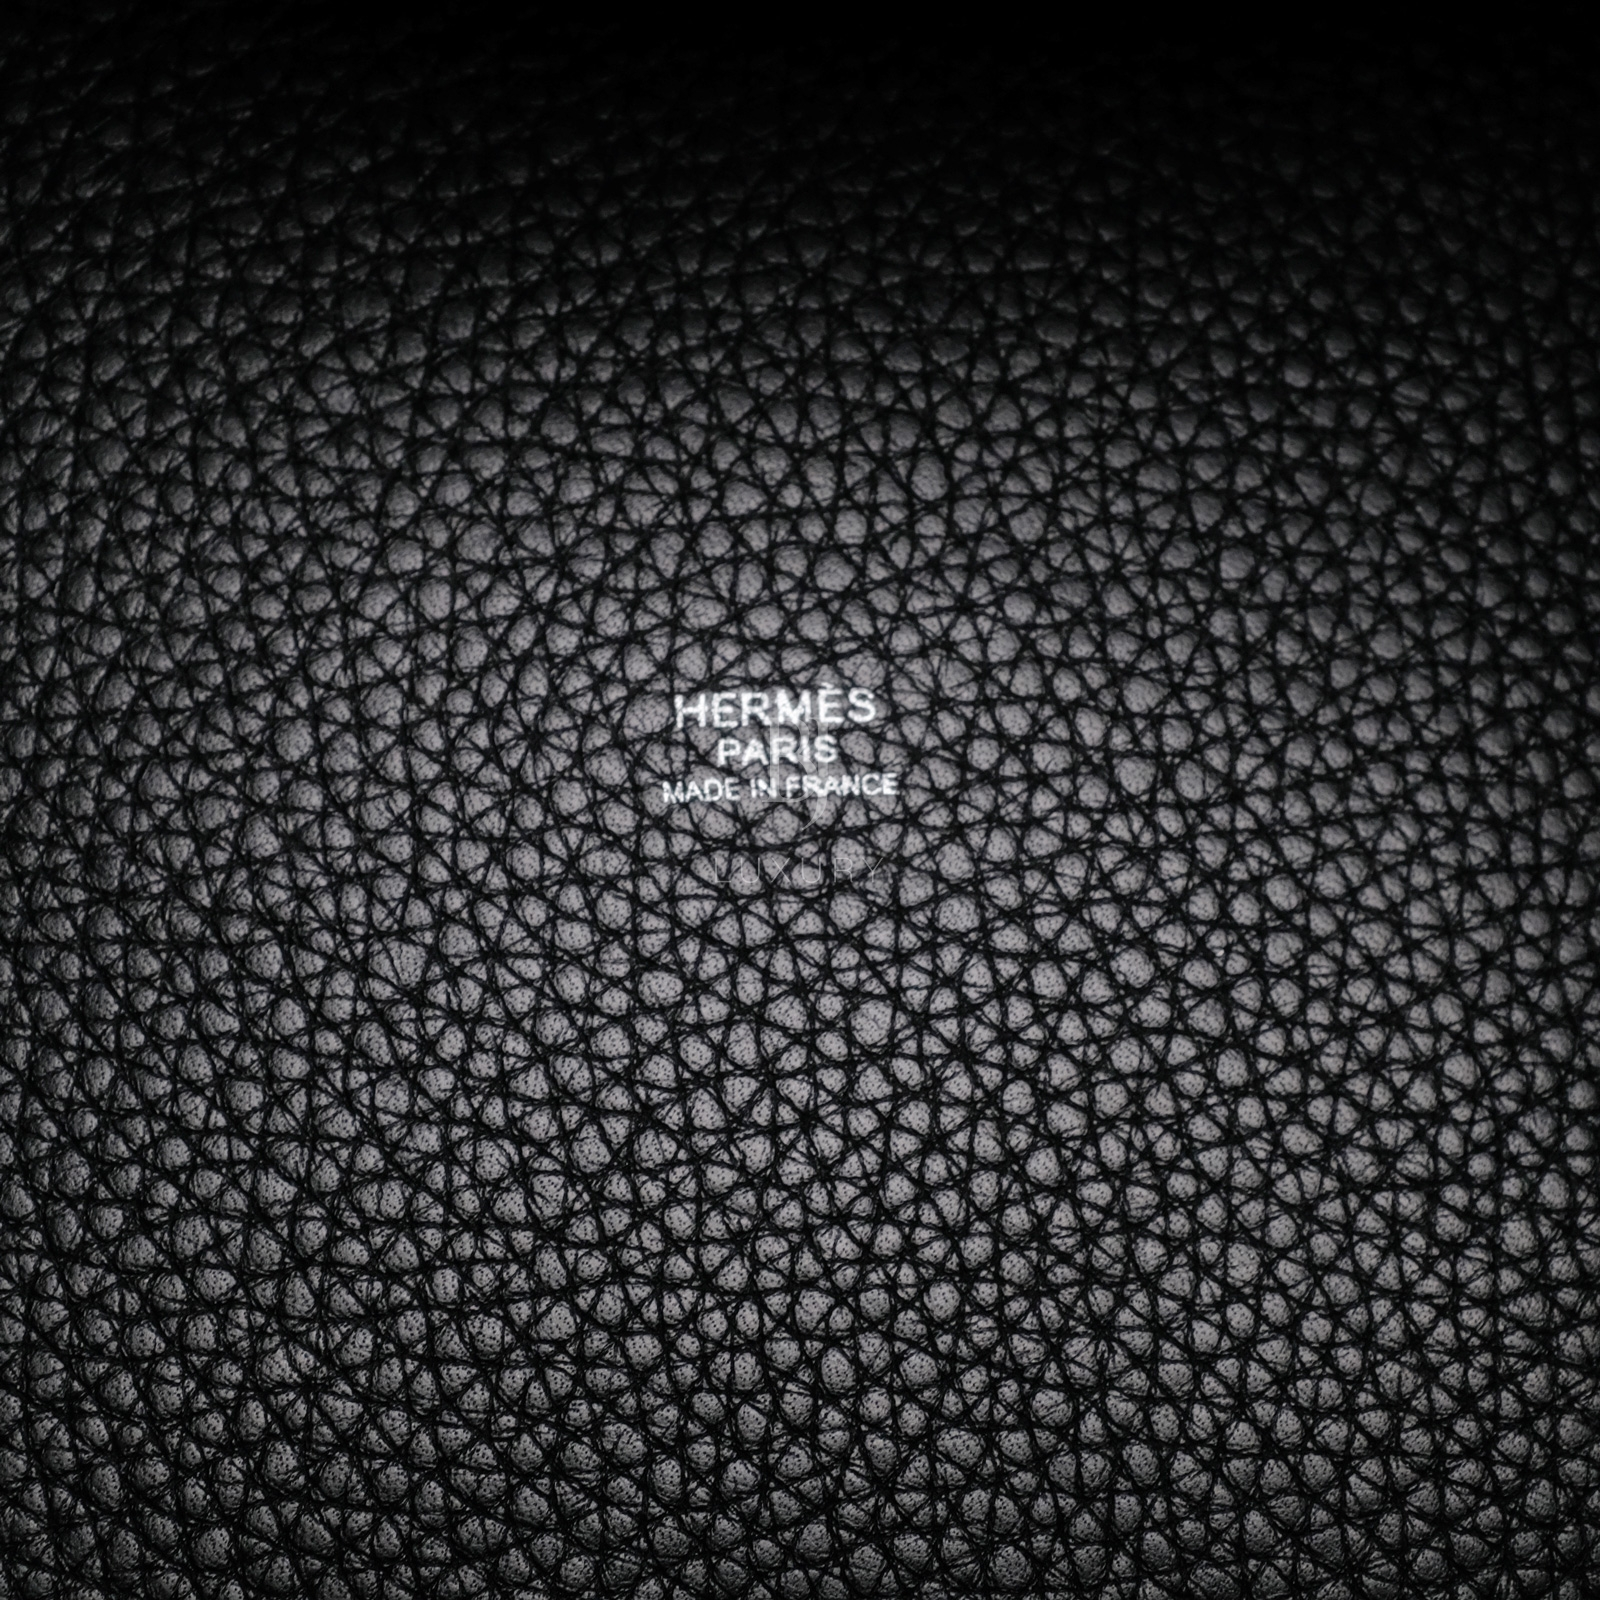 Hermes Picotin 22 Palladium Clemence BJ Luxury 12.jpg